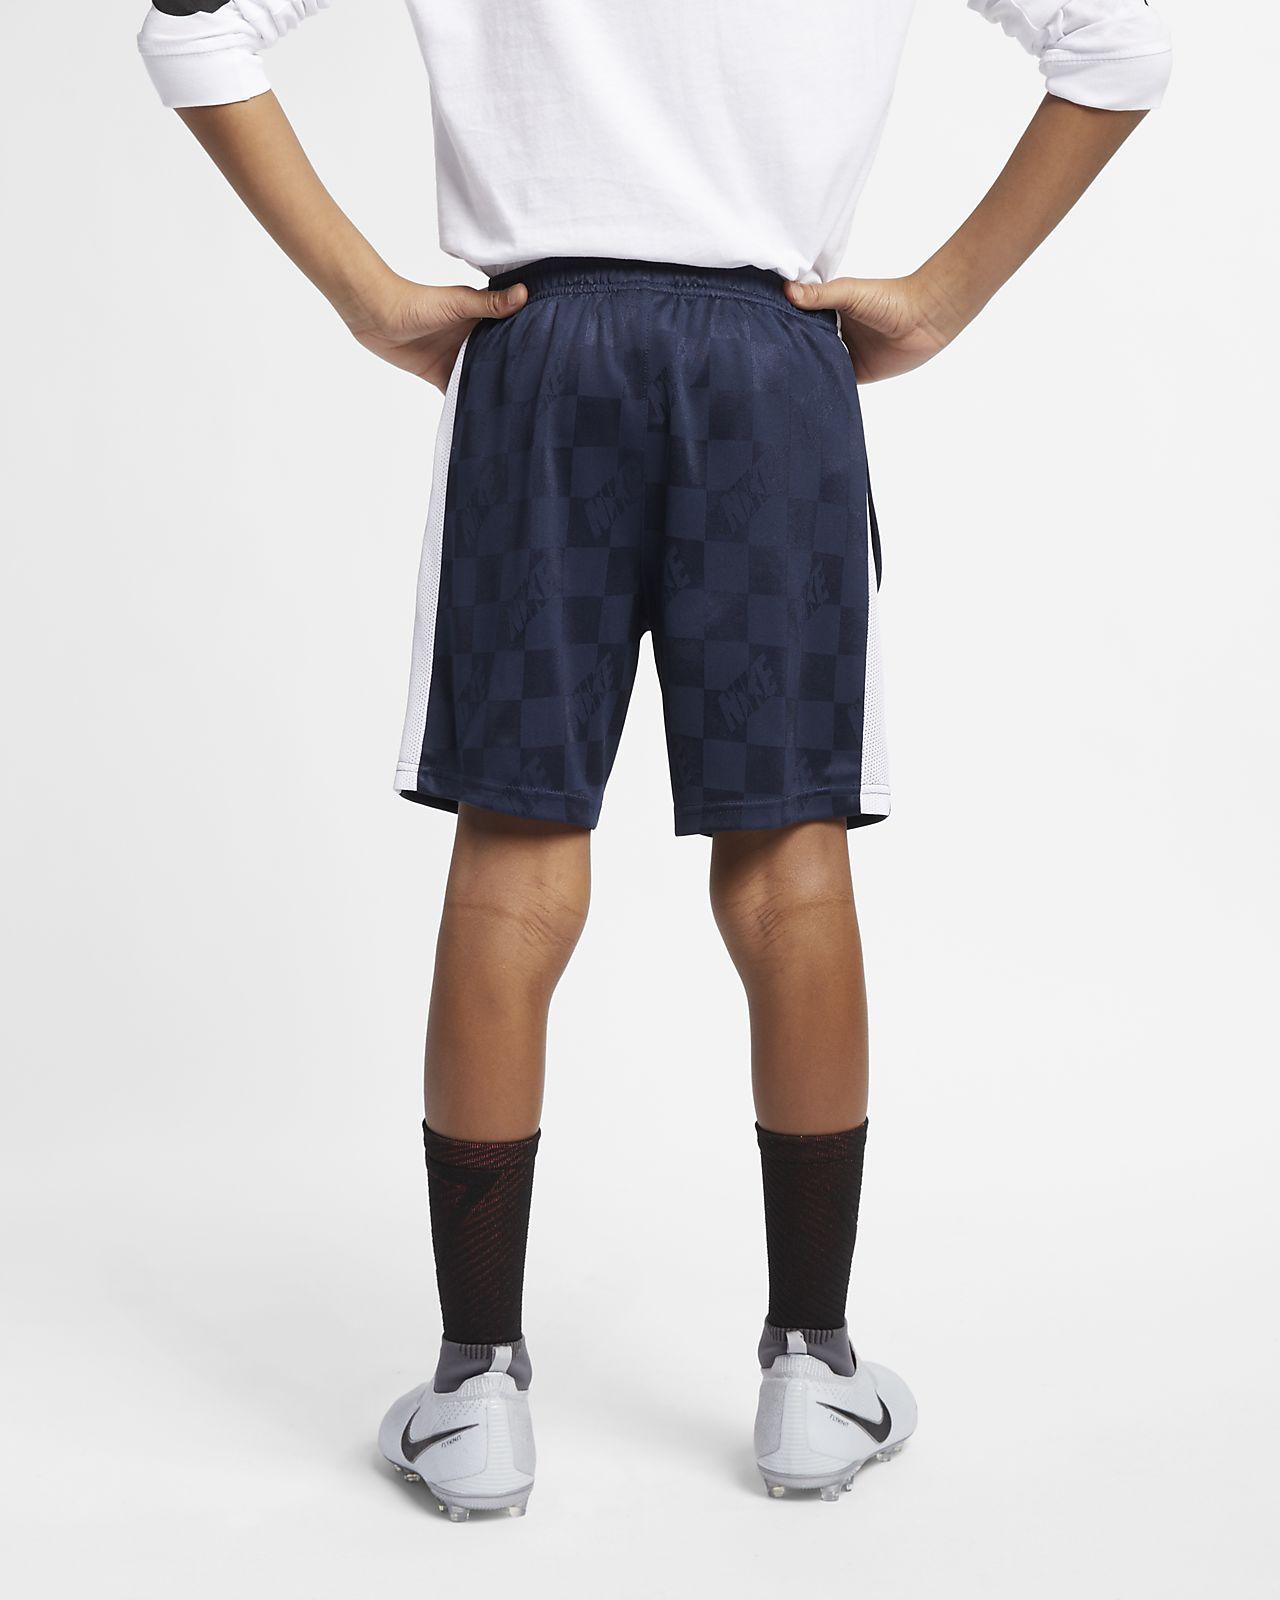 41942f3cc3 Nike Breathe Academy Pantalón corto de fútbol - Niño a. Nike.com ES